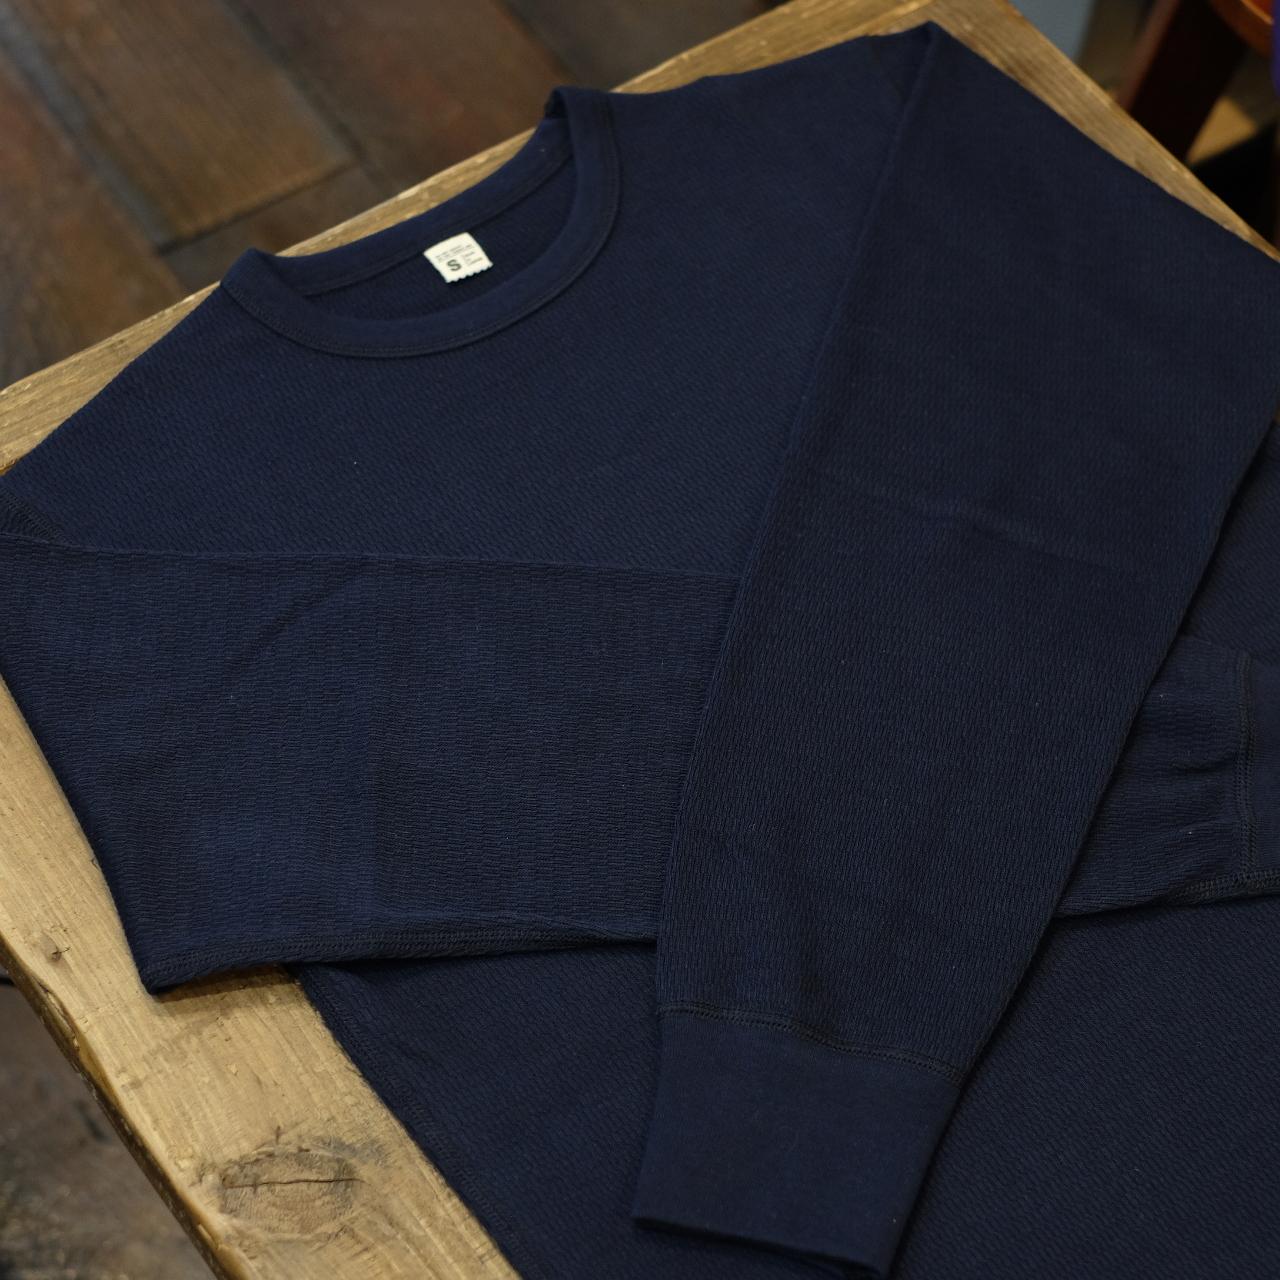 Workers(ワーカーズ) サーマルロングTシャツ クルーネック ネイビー